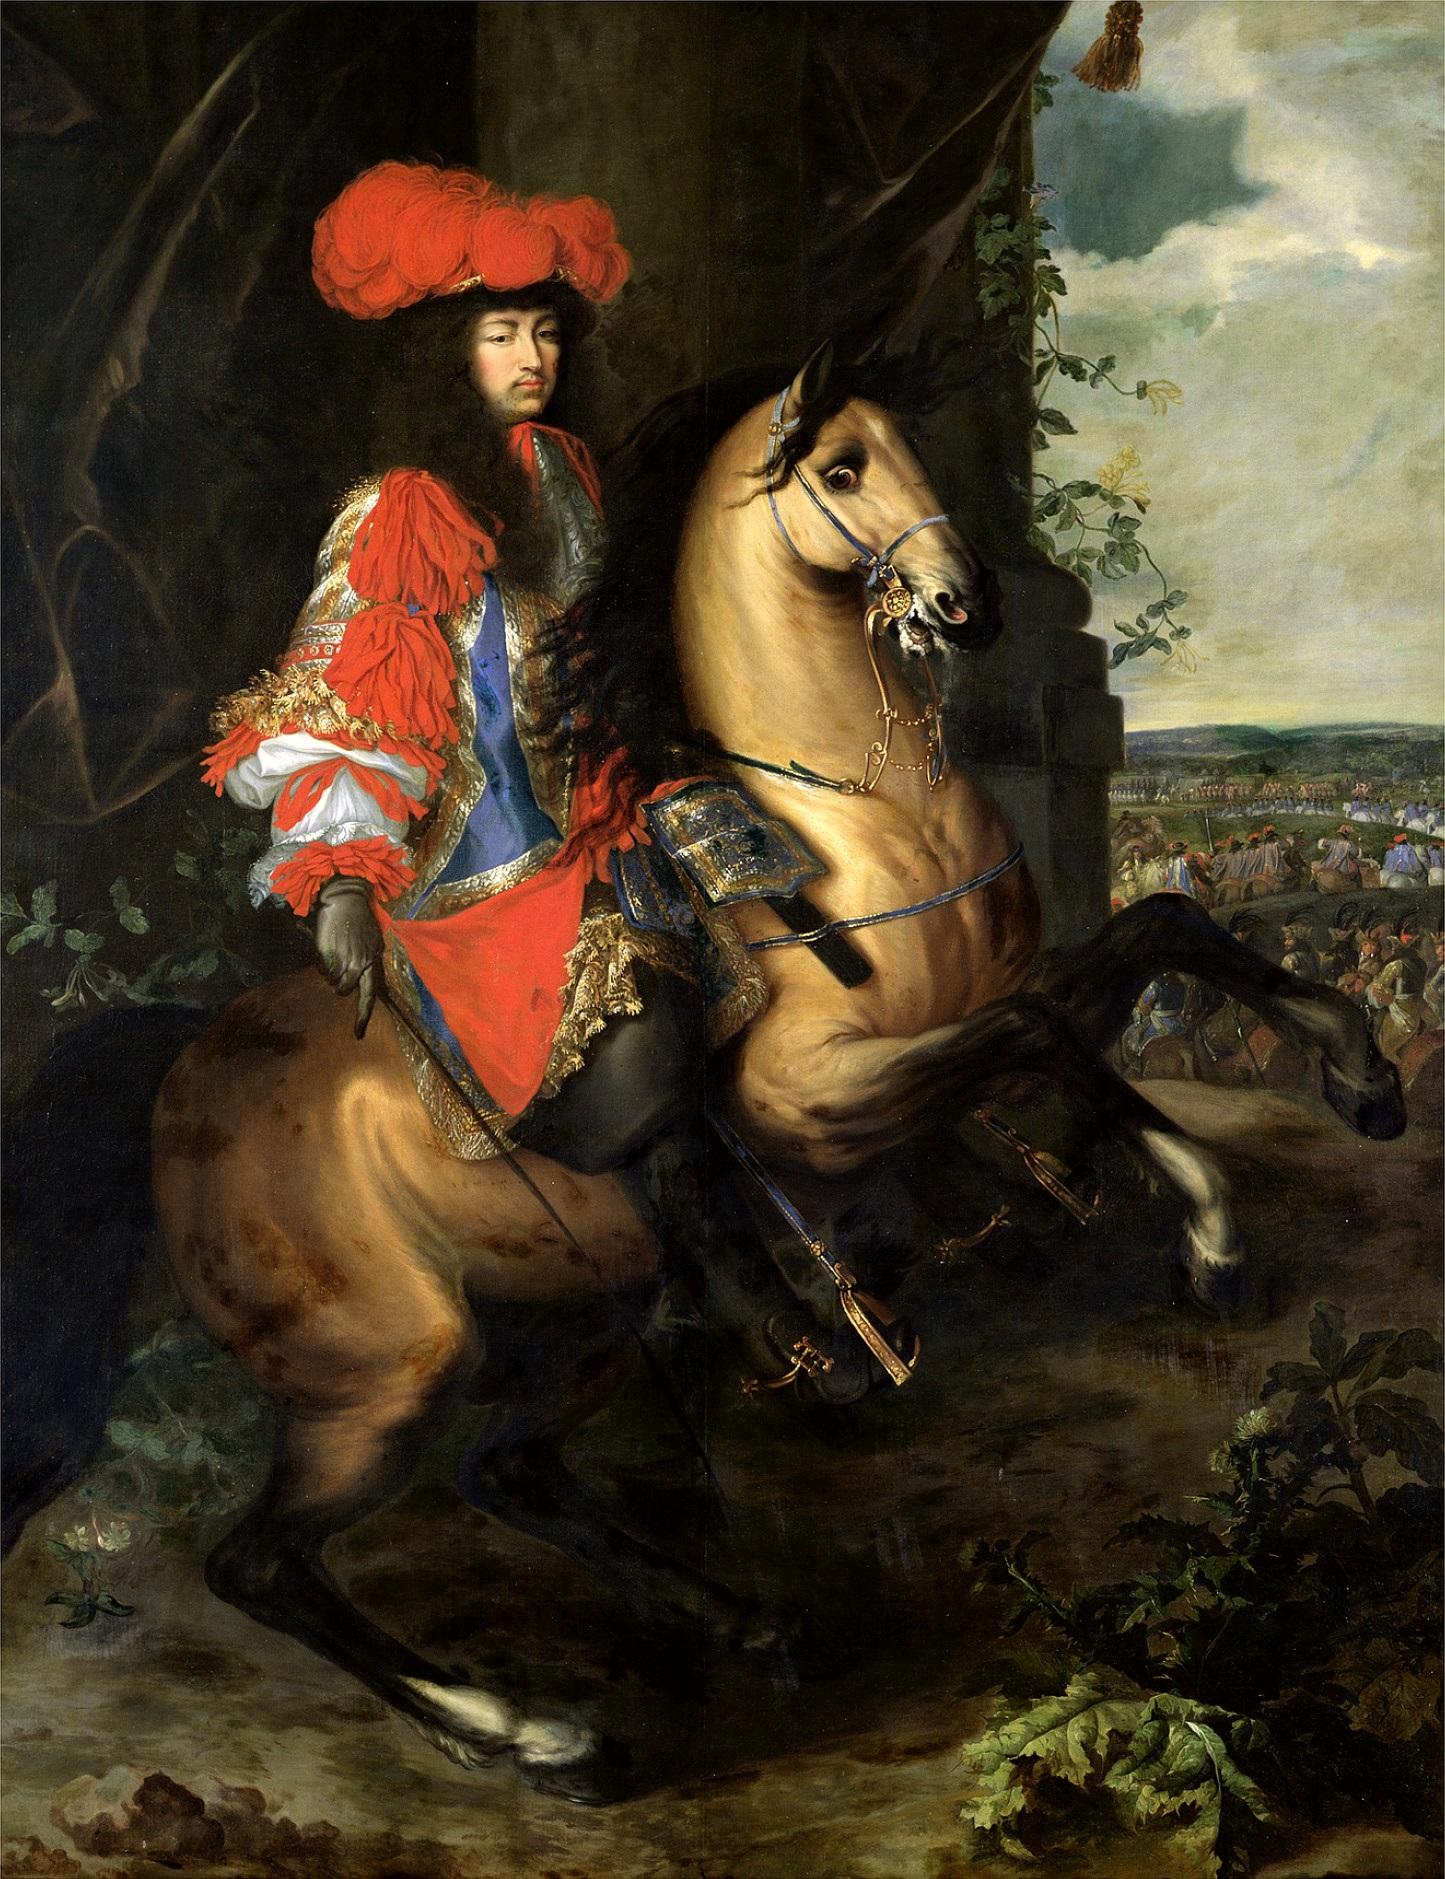 https://upload.wikimedia.org/wikipedia/commons/d/d4/Louis_XIV_Equestrian_Portrait.jpg